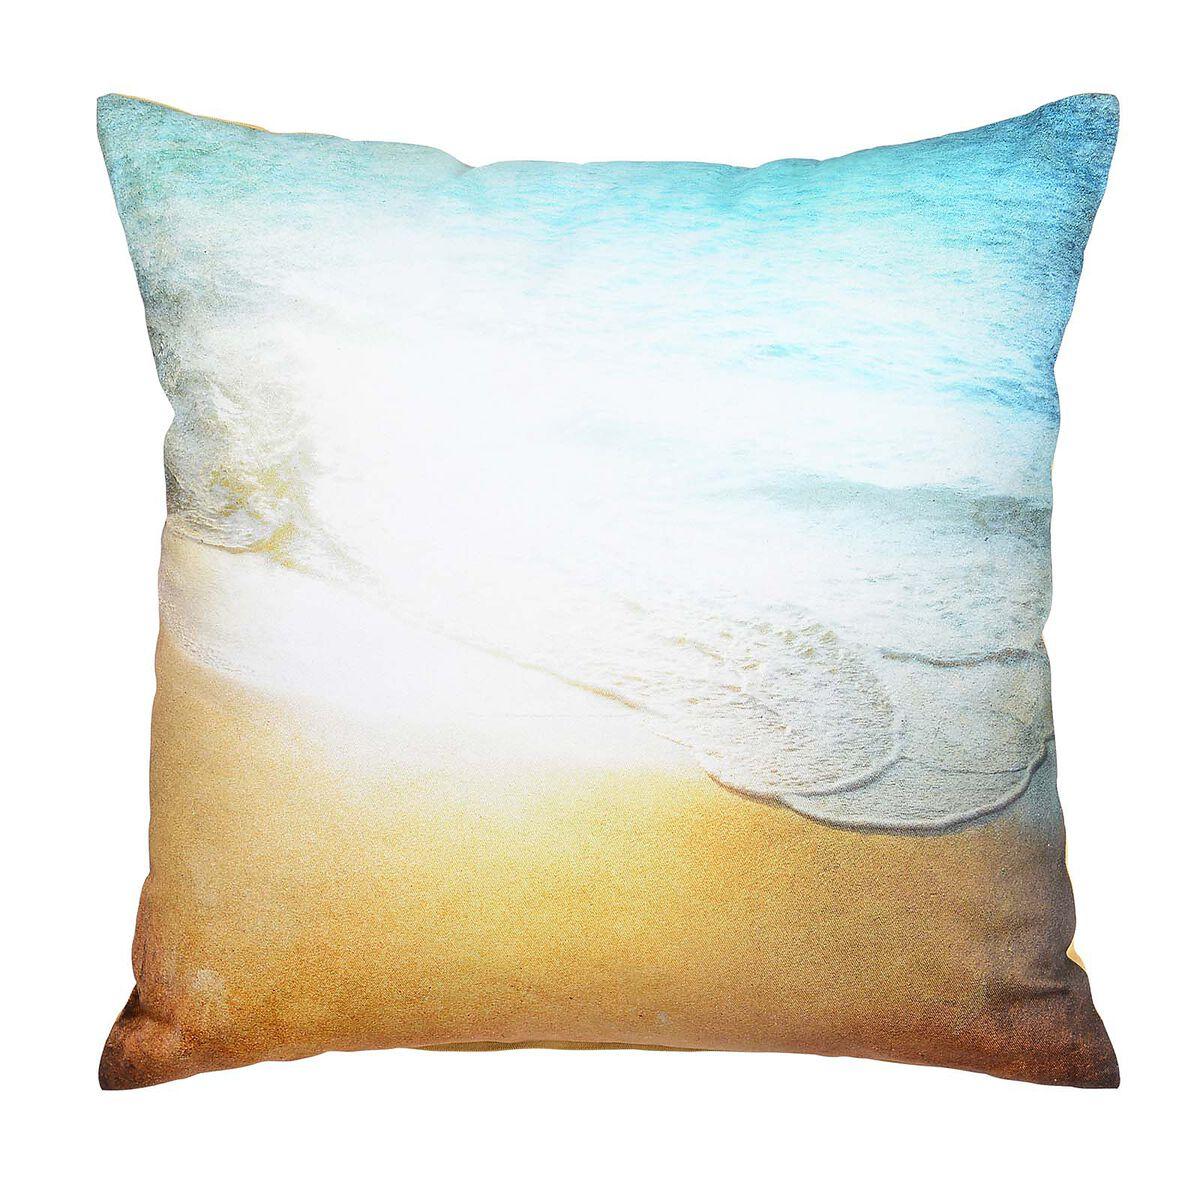 kissen seaside ca b 45 x l 45cm t rkis depot de. Black Bedroom Furniture Sets. Home Design Ideas